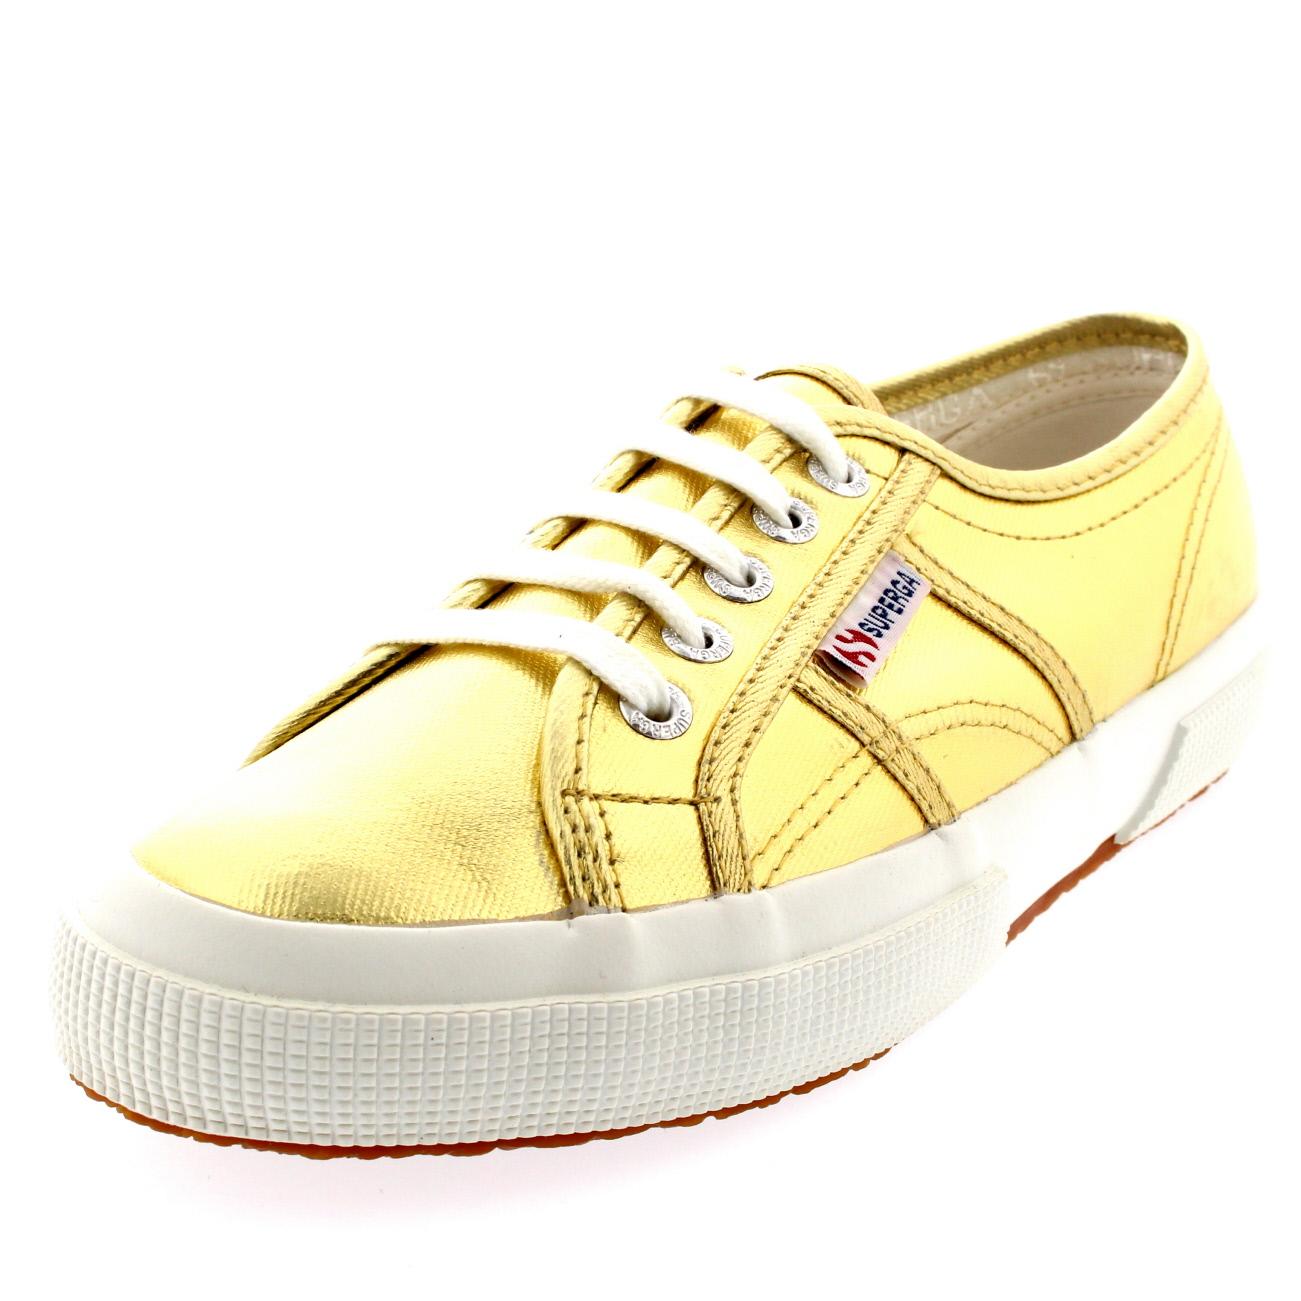 mesdames superga 2750 cotmetu plat plat plat chaussures métalliques occasionnels bas haut d3a44f